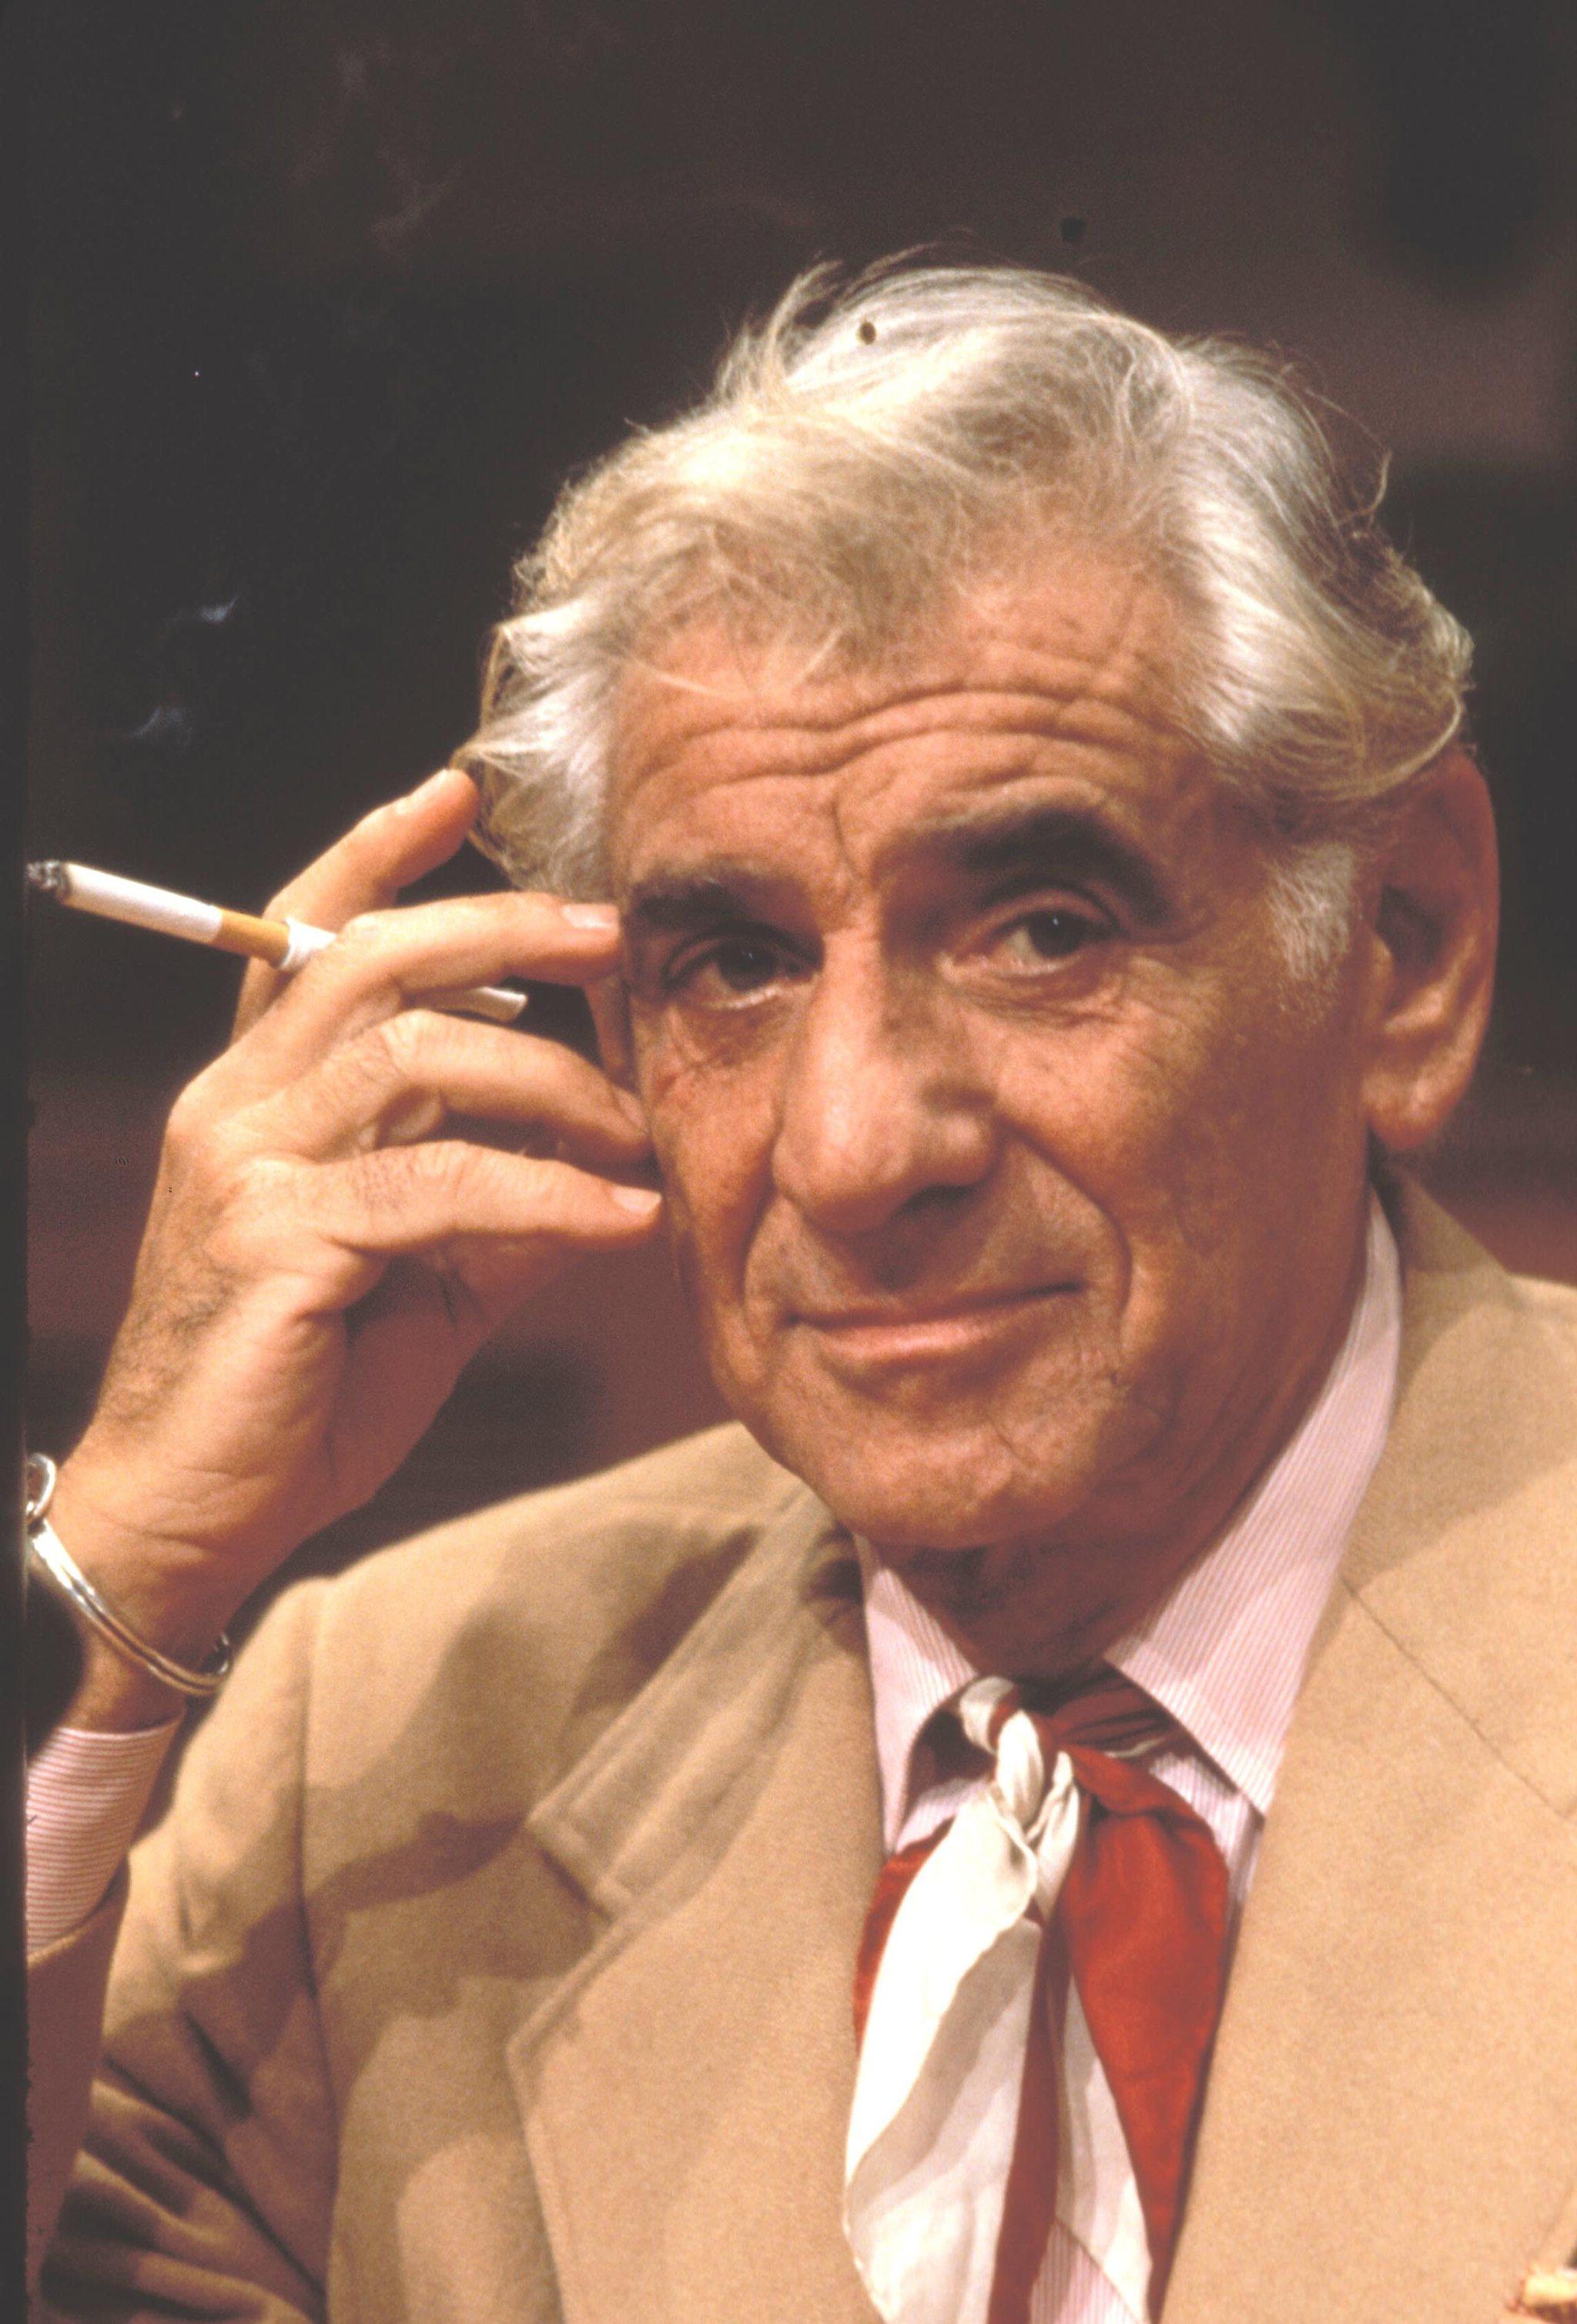 El director de orquesta Leonard Bernstein en una imagen de 1970.